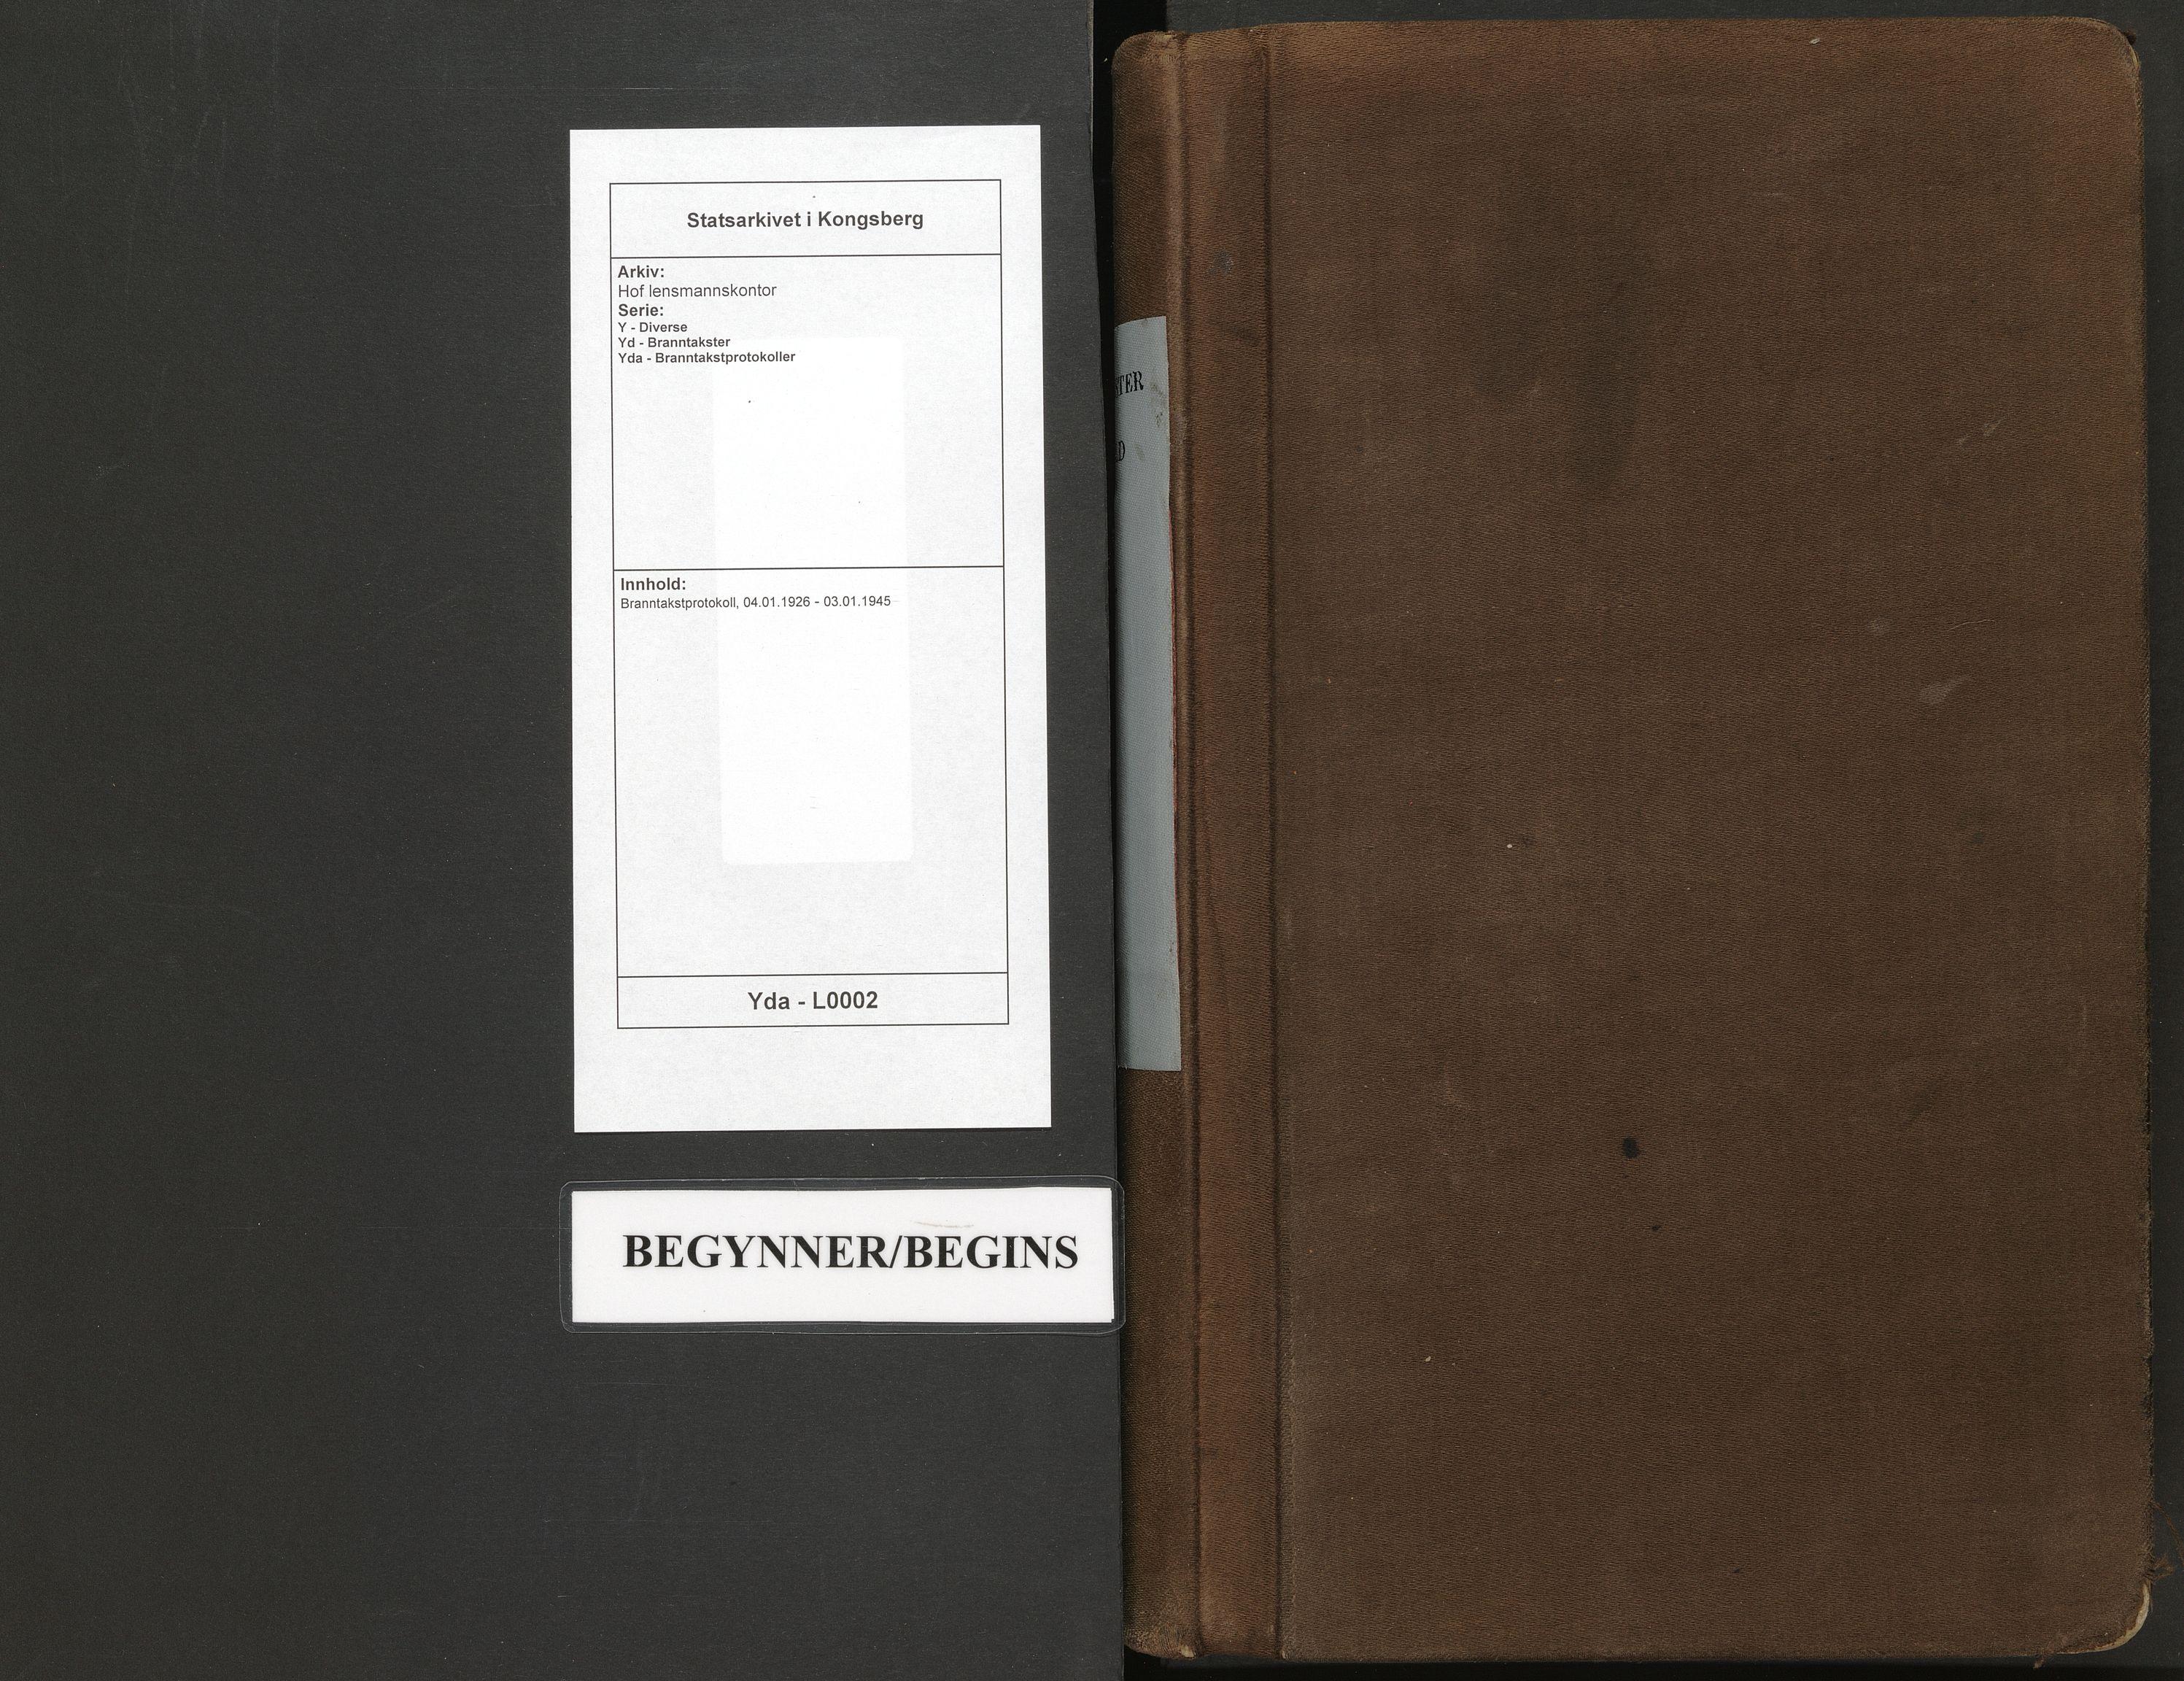 SAKO, Hof lensmannskontor, Y/Yd/Yda/L0002: Branntakstprotokoll, 1926-1945